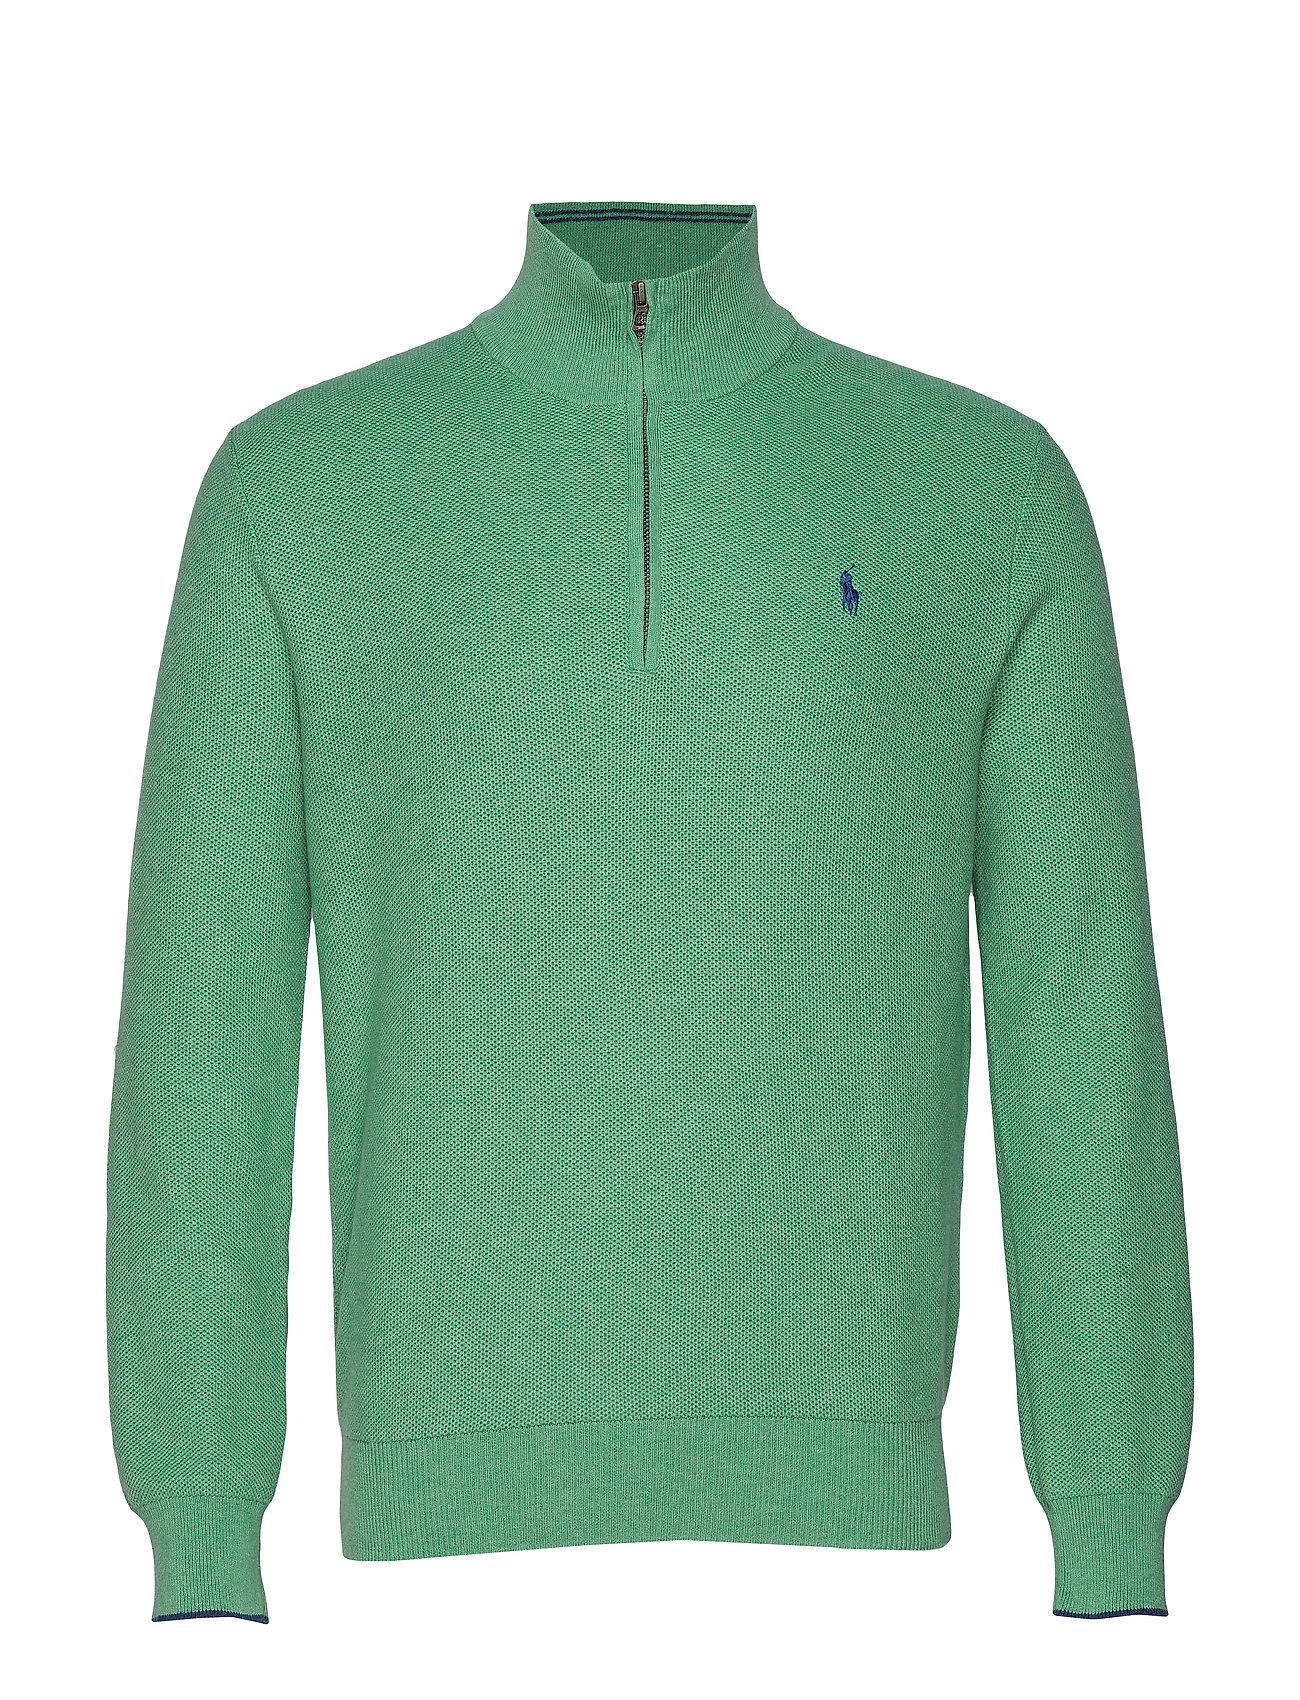 Polo Ralph Lauren Cotton Half-Zip Sweater - PALE EMERALD HEAT